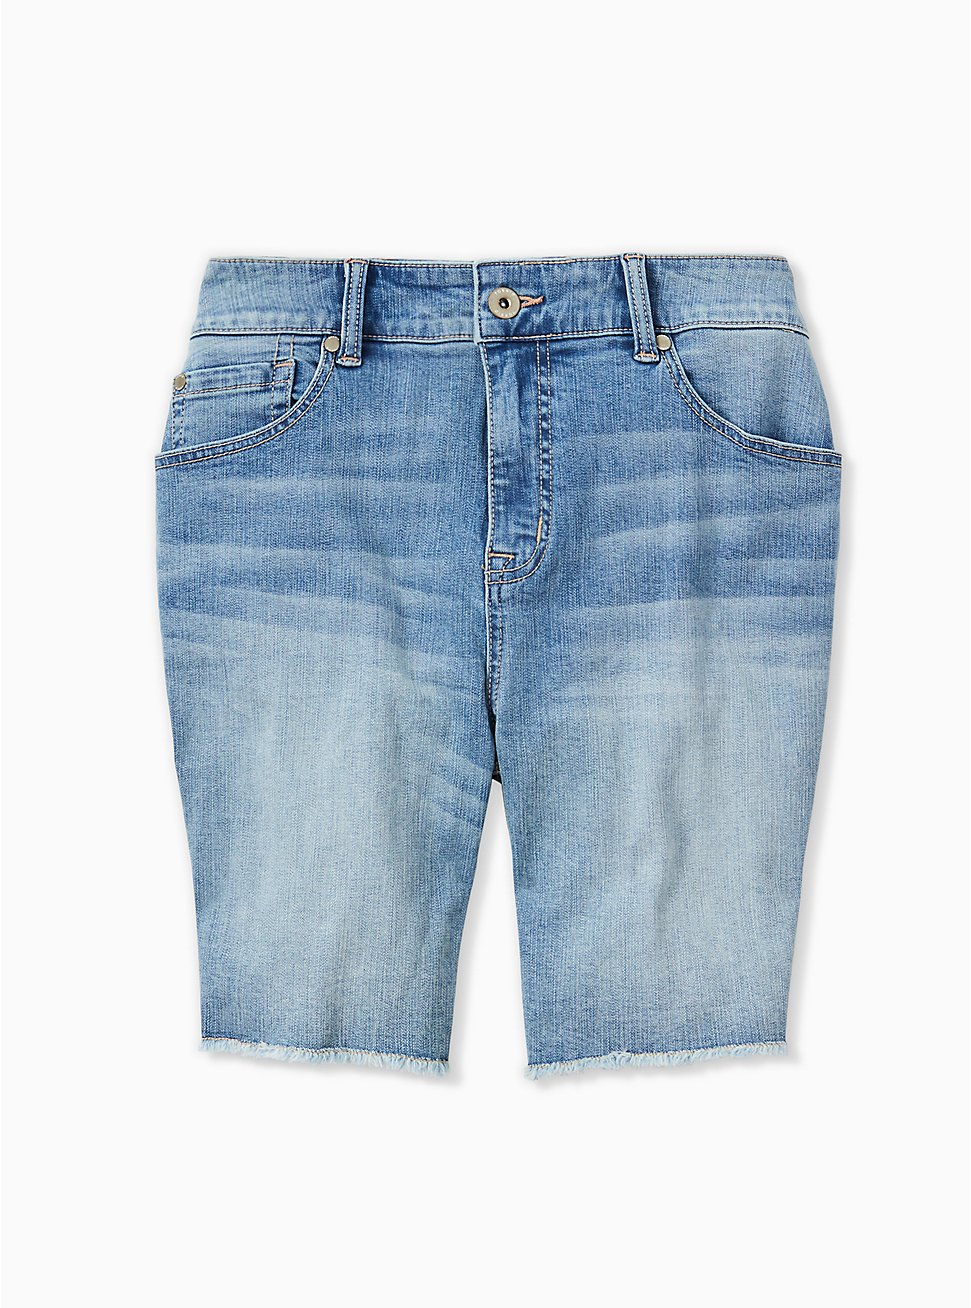 Plus Size High Rise Bermuda Short - Vintage Stretch Medium Wash, CITY GAMES, hi-res